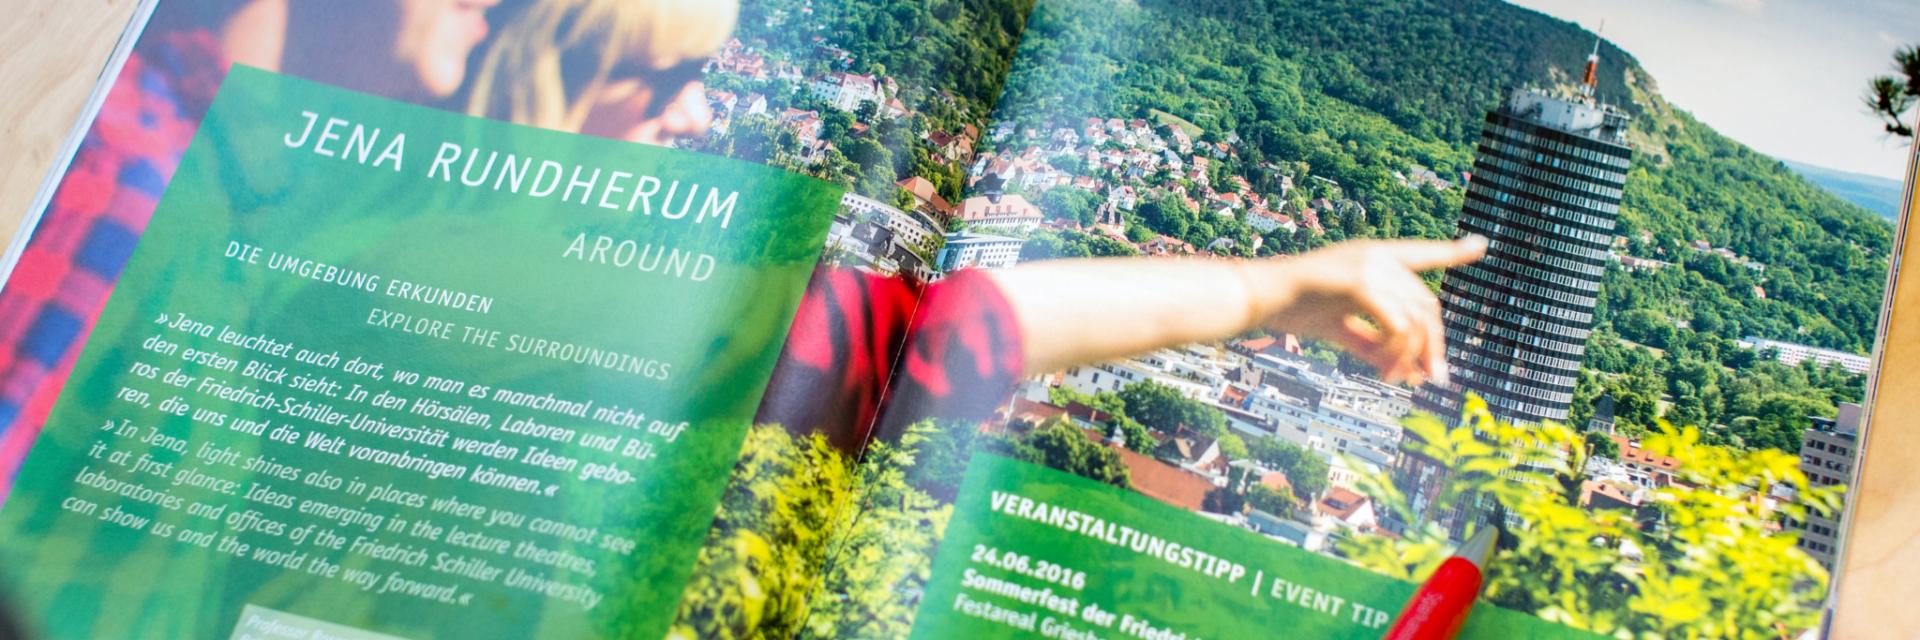 Broschüre zum Tagen in Jena - Downloads © JenaKultur, Foto: Christoph Worsch